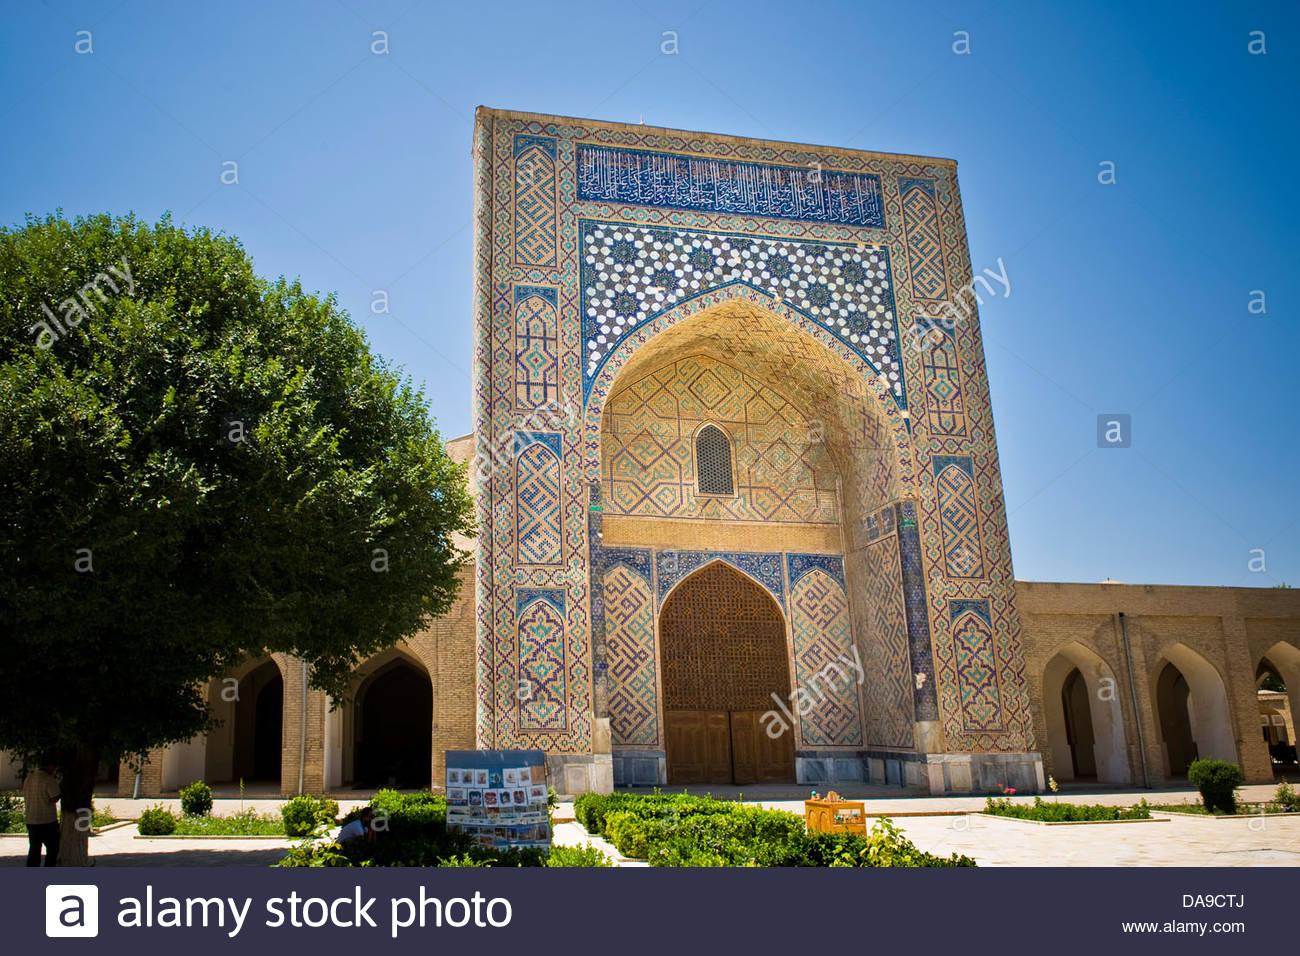 Uzbekistan,Shakhrisabz,Dor Ut Tilovat complex - Stock Image